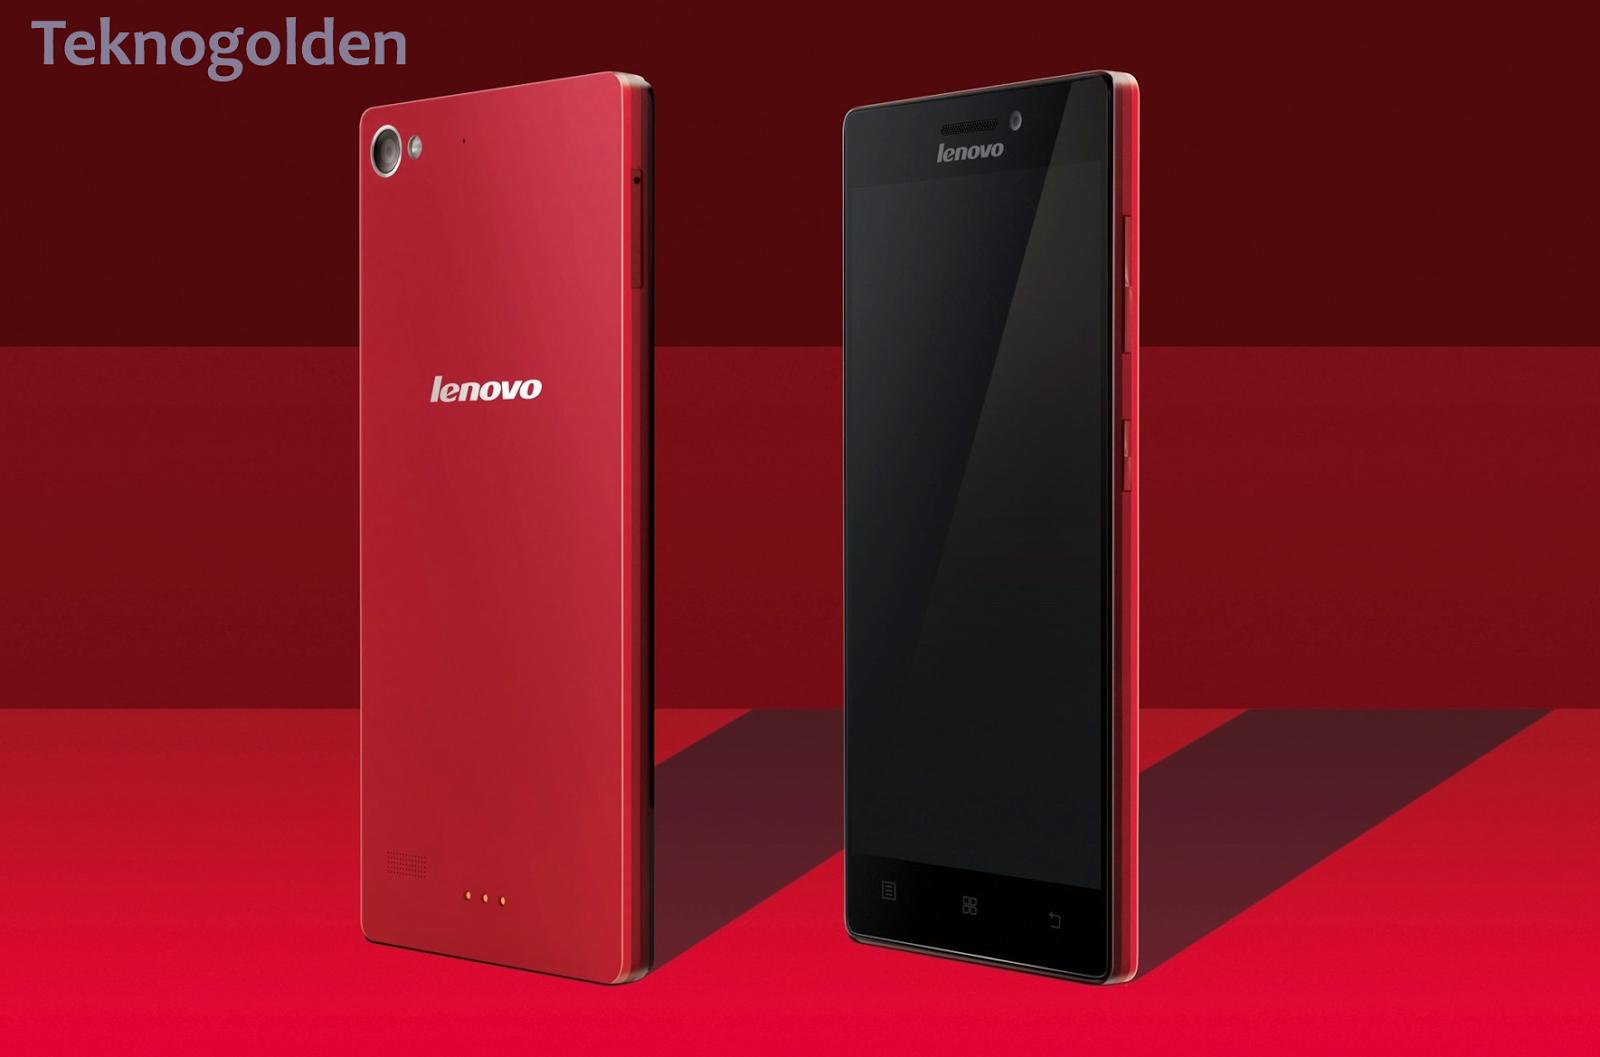 Spesifikasi Lenovo Vibe X2 Smartphone Dengan Kamera 13mp Teknogolden X S960 With Corning Gorilla Glass